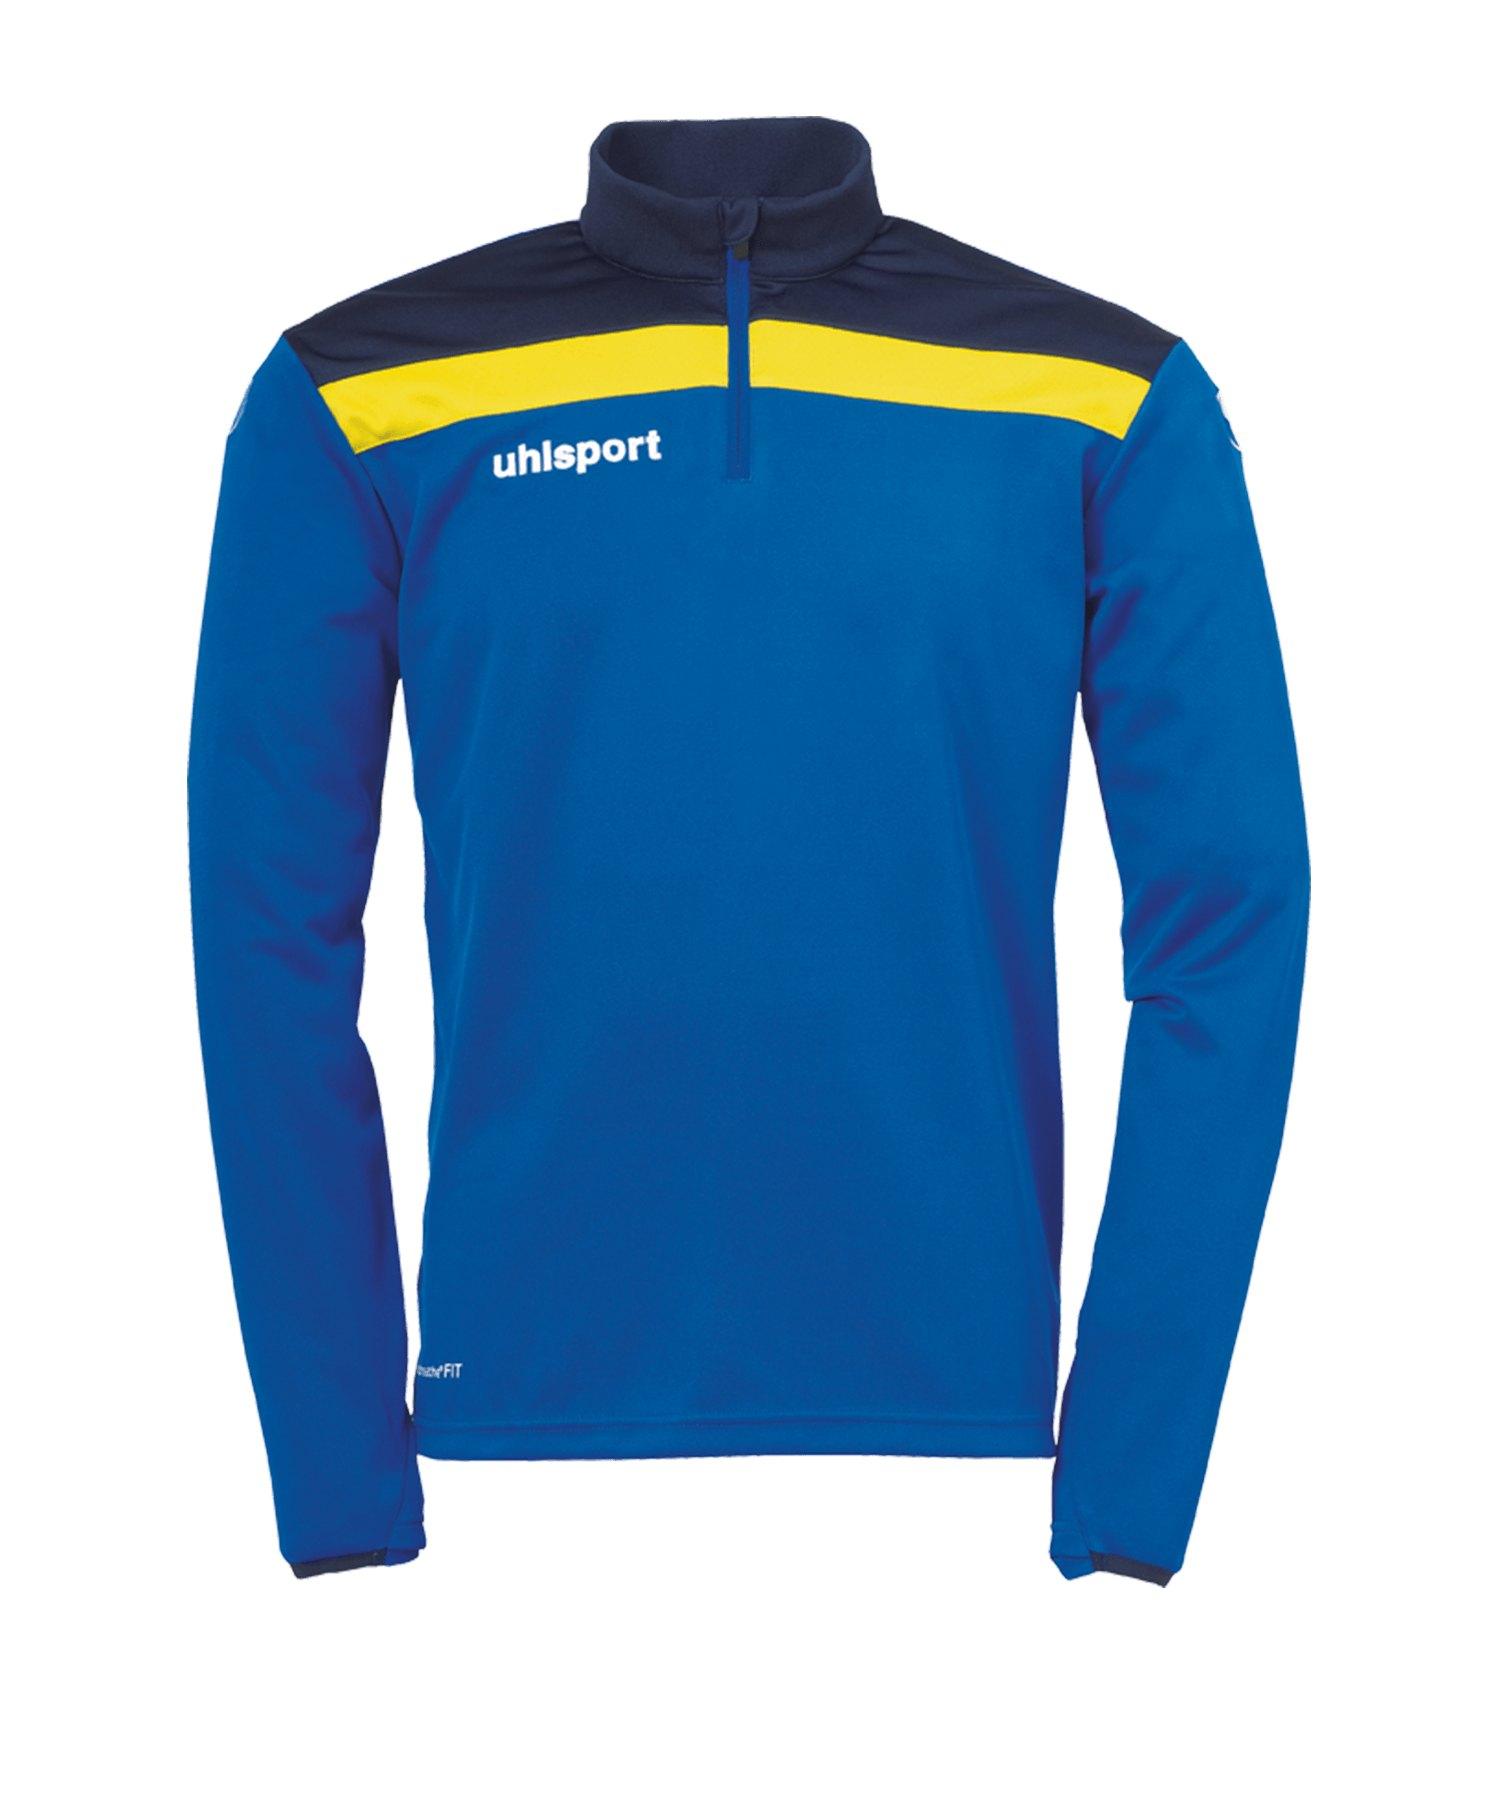 Uhlsport Offense 23 Ziptop Blau F11 - blau